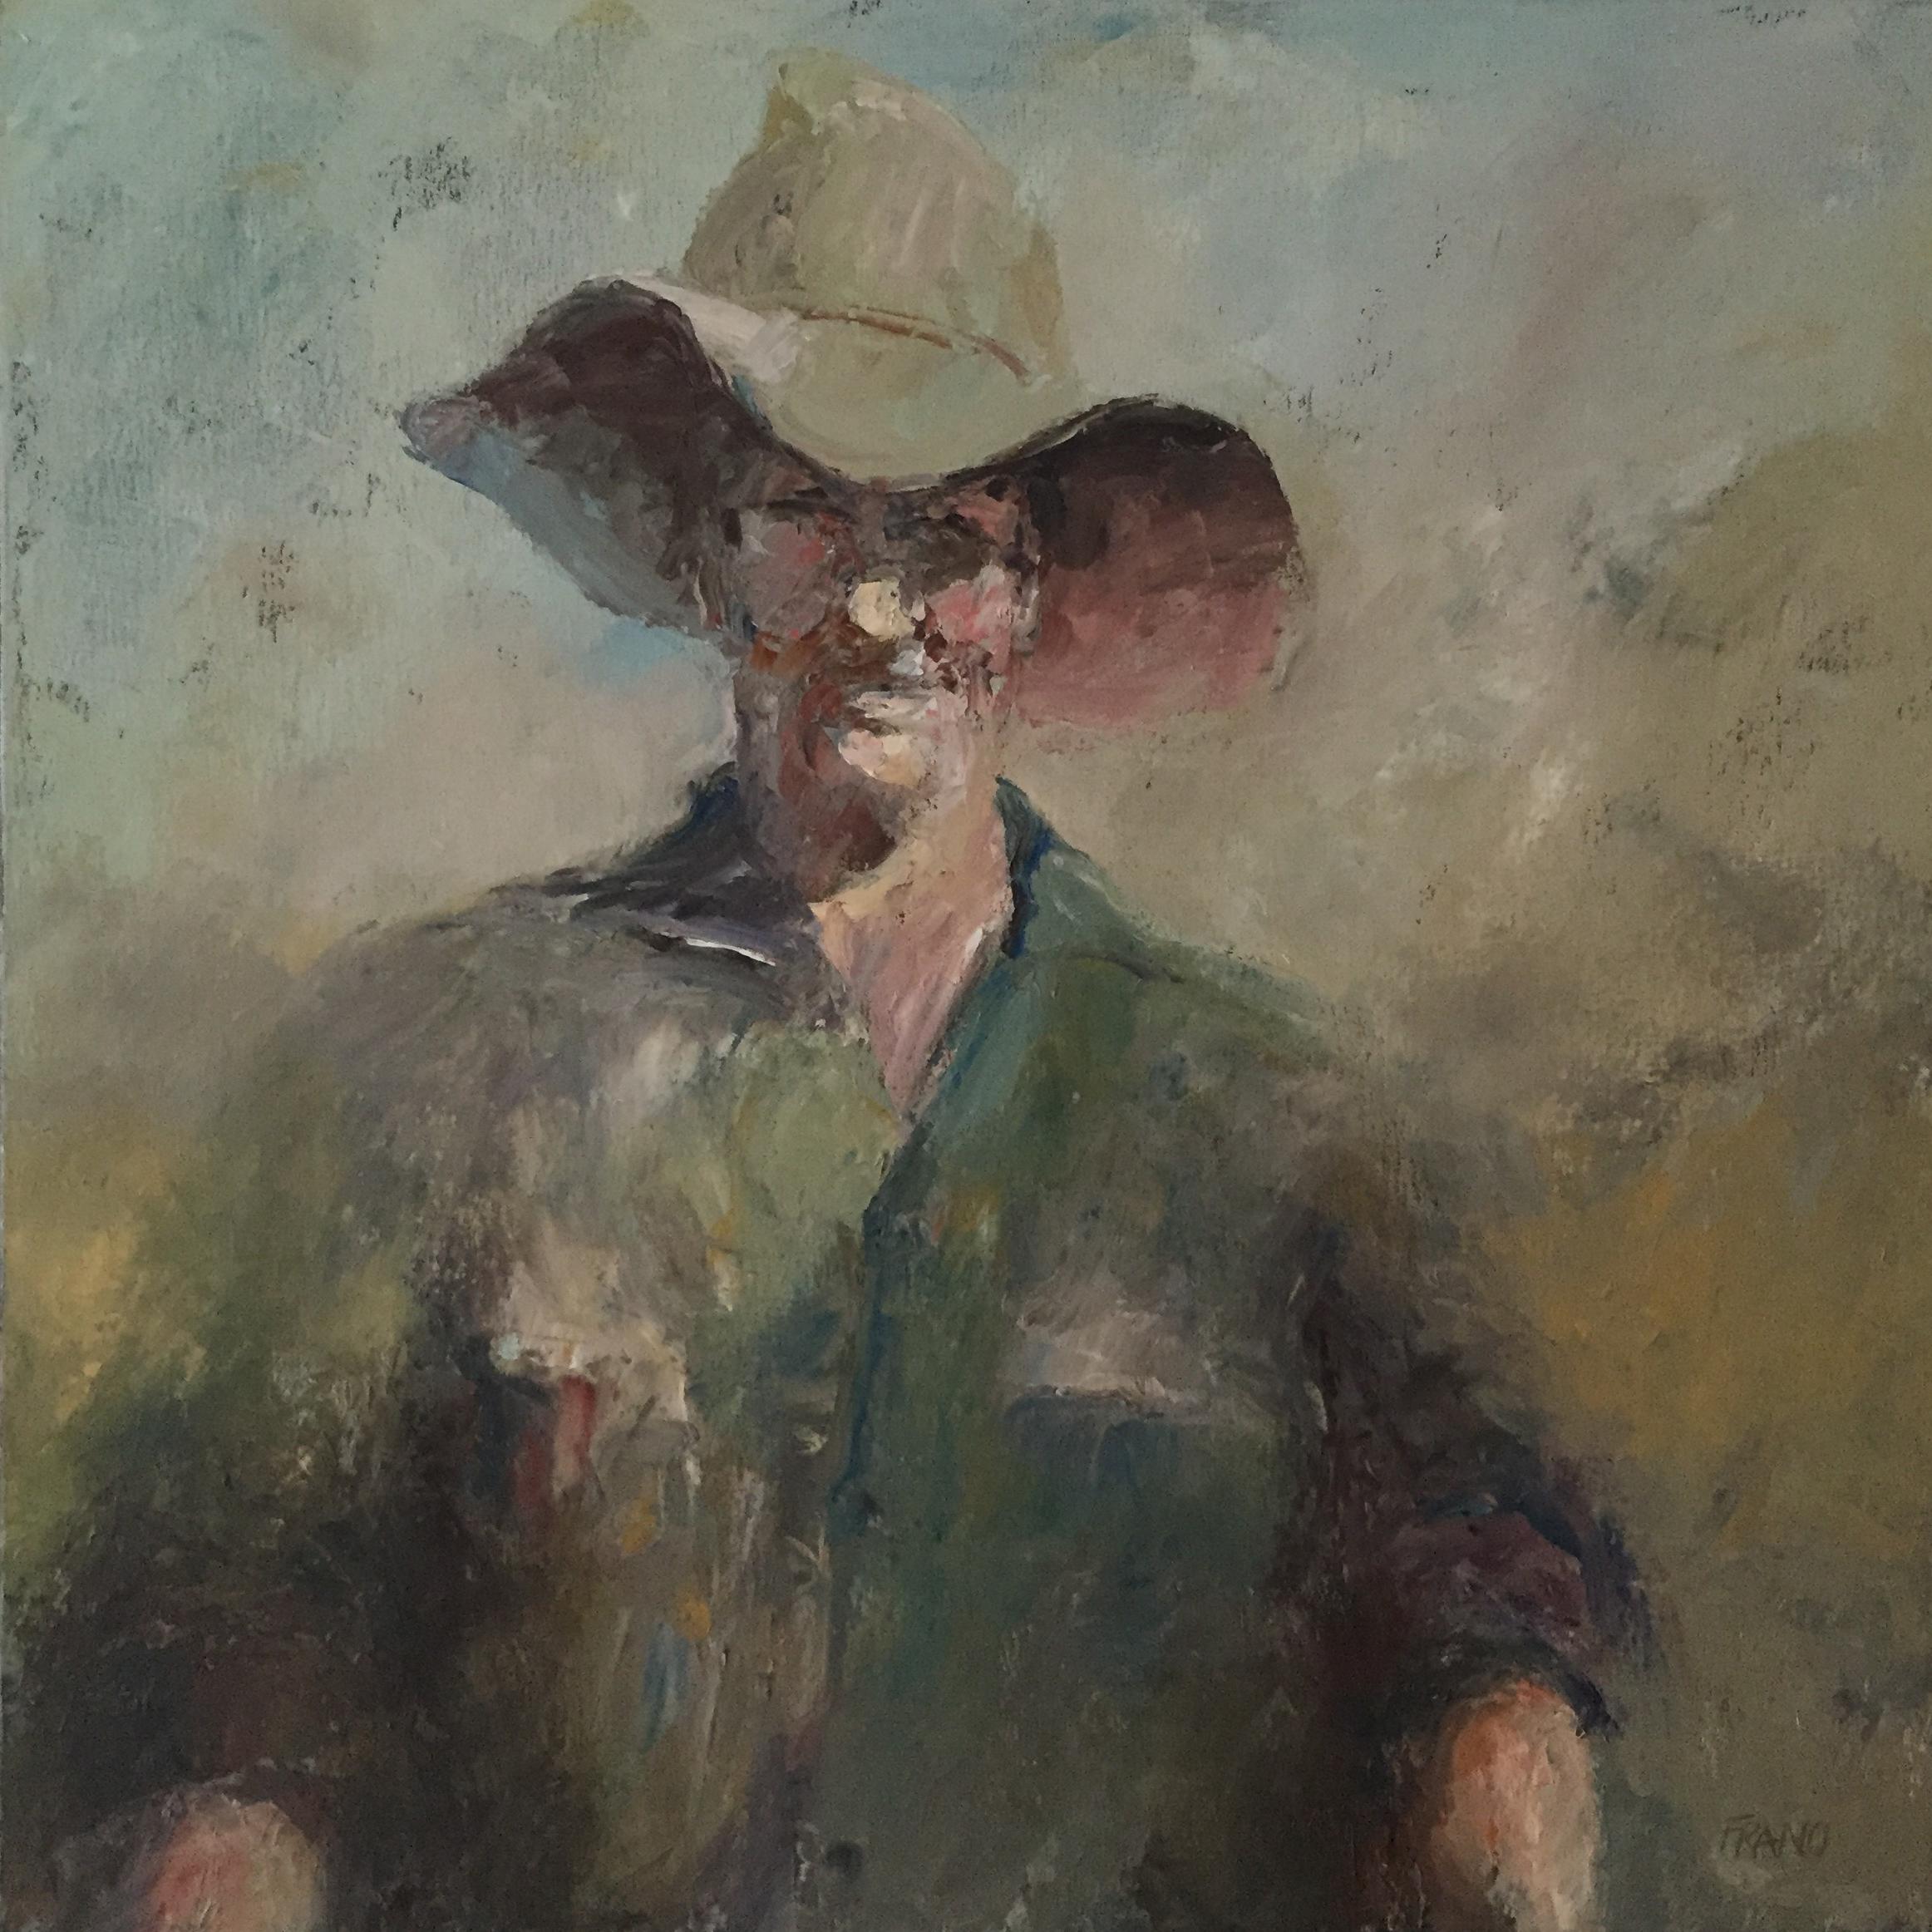 Farmer-Oil-Painting-by-Frano.jpg